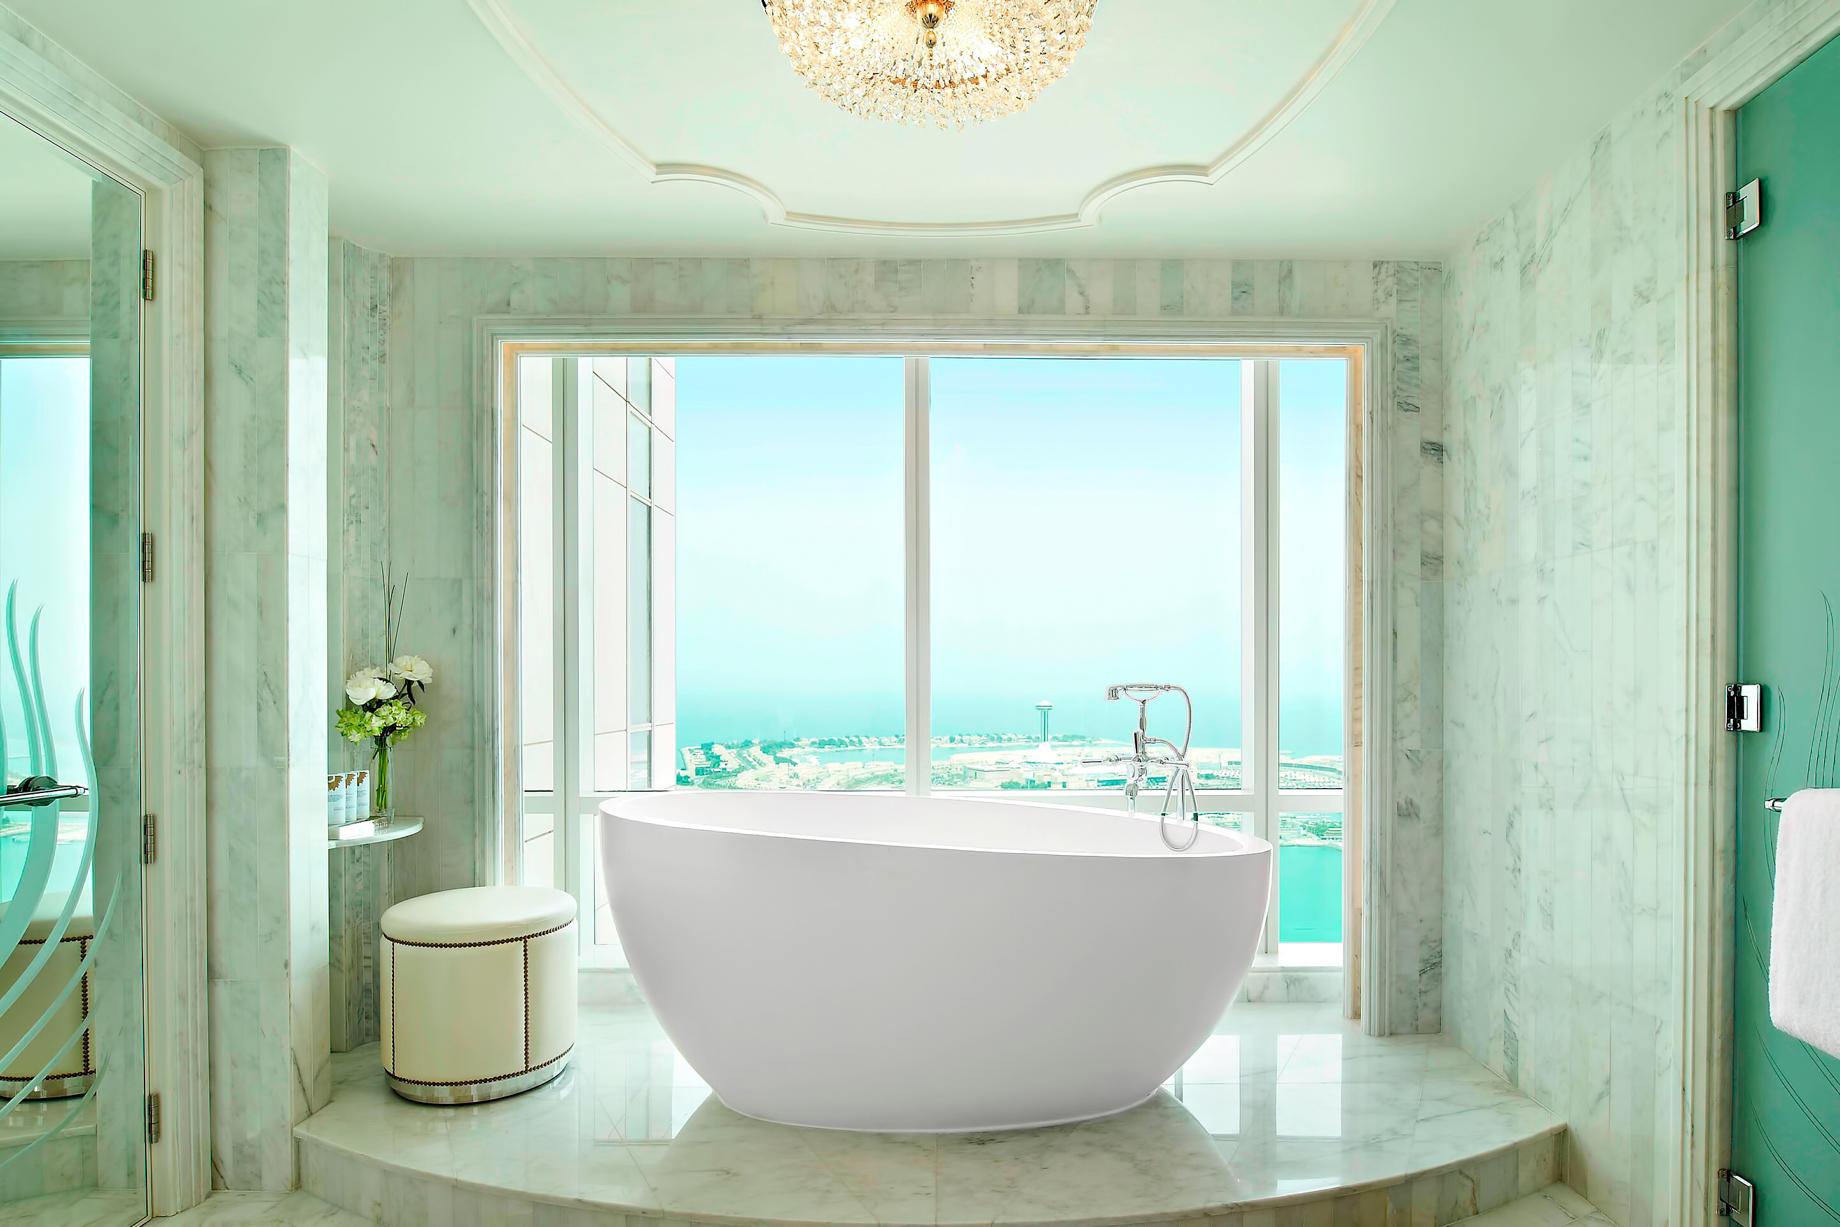 The St. Regis Abu Dhabi Luxury Hotel – Abu Dhabi, United Arab Emirates – Grand Deluxe Suite Bathroom